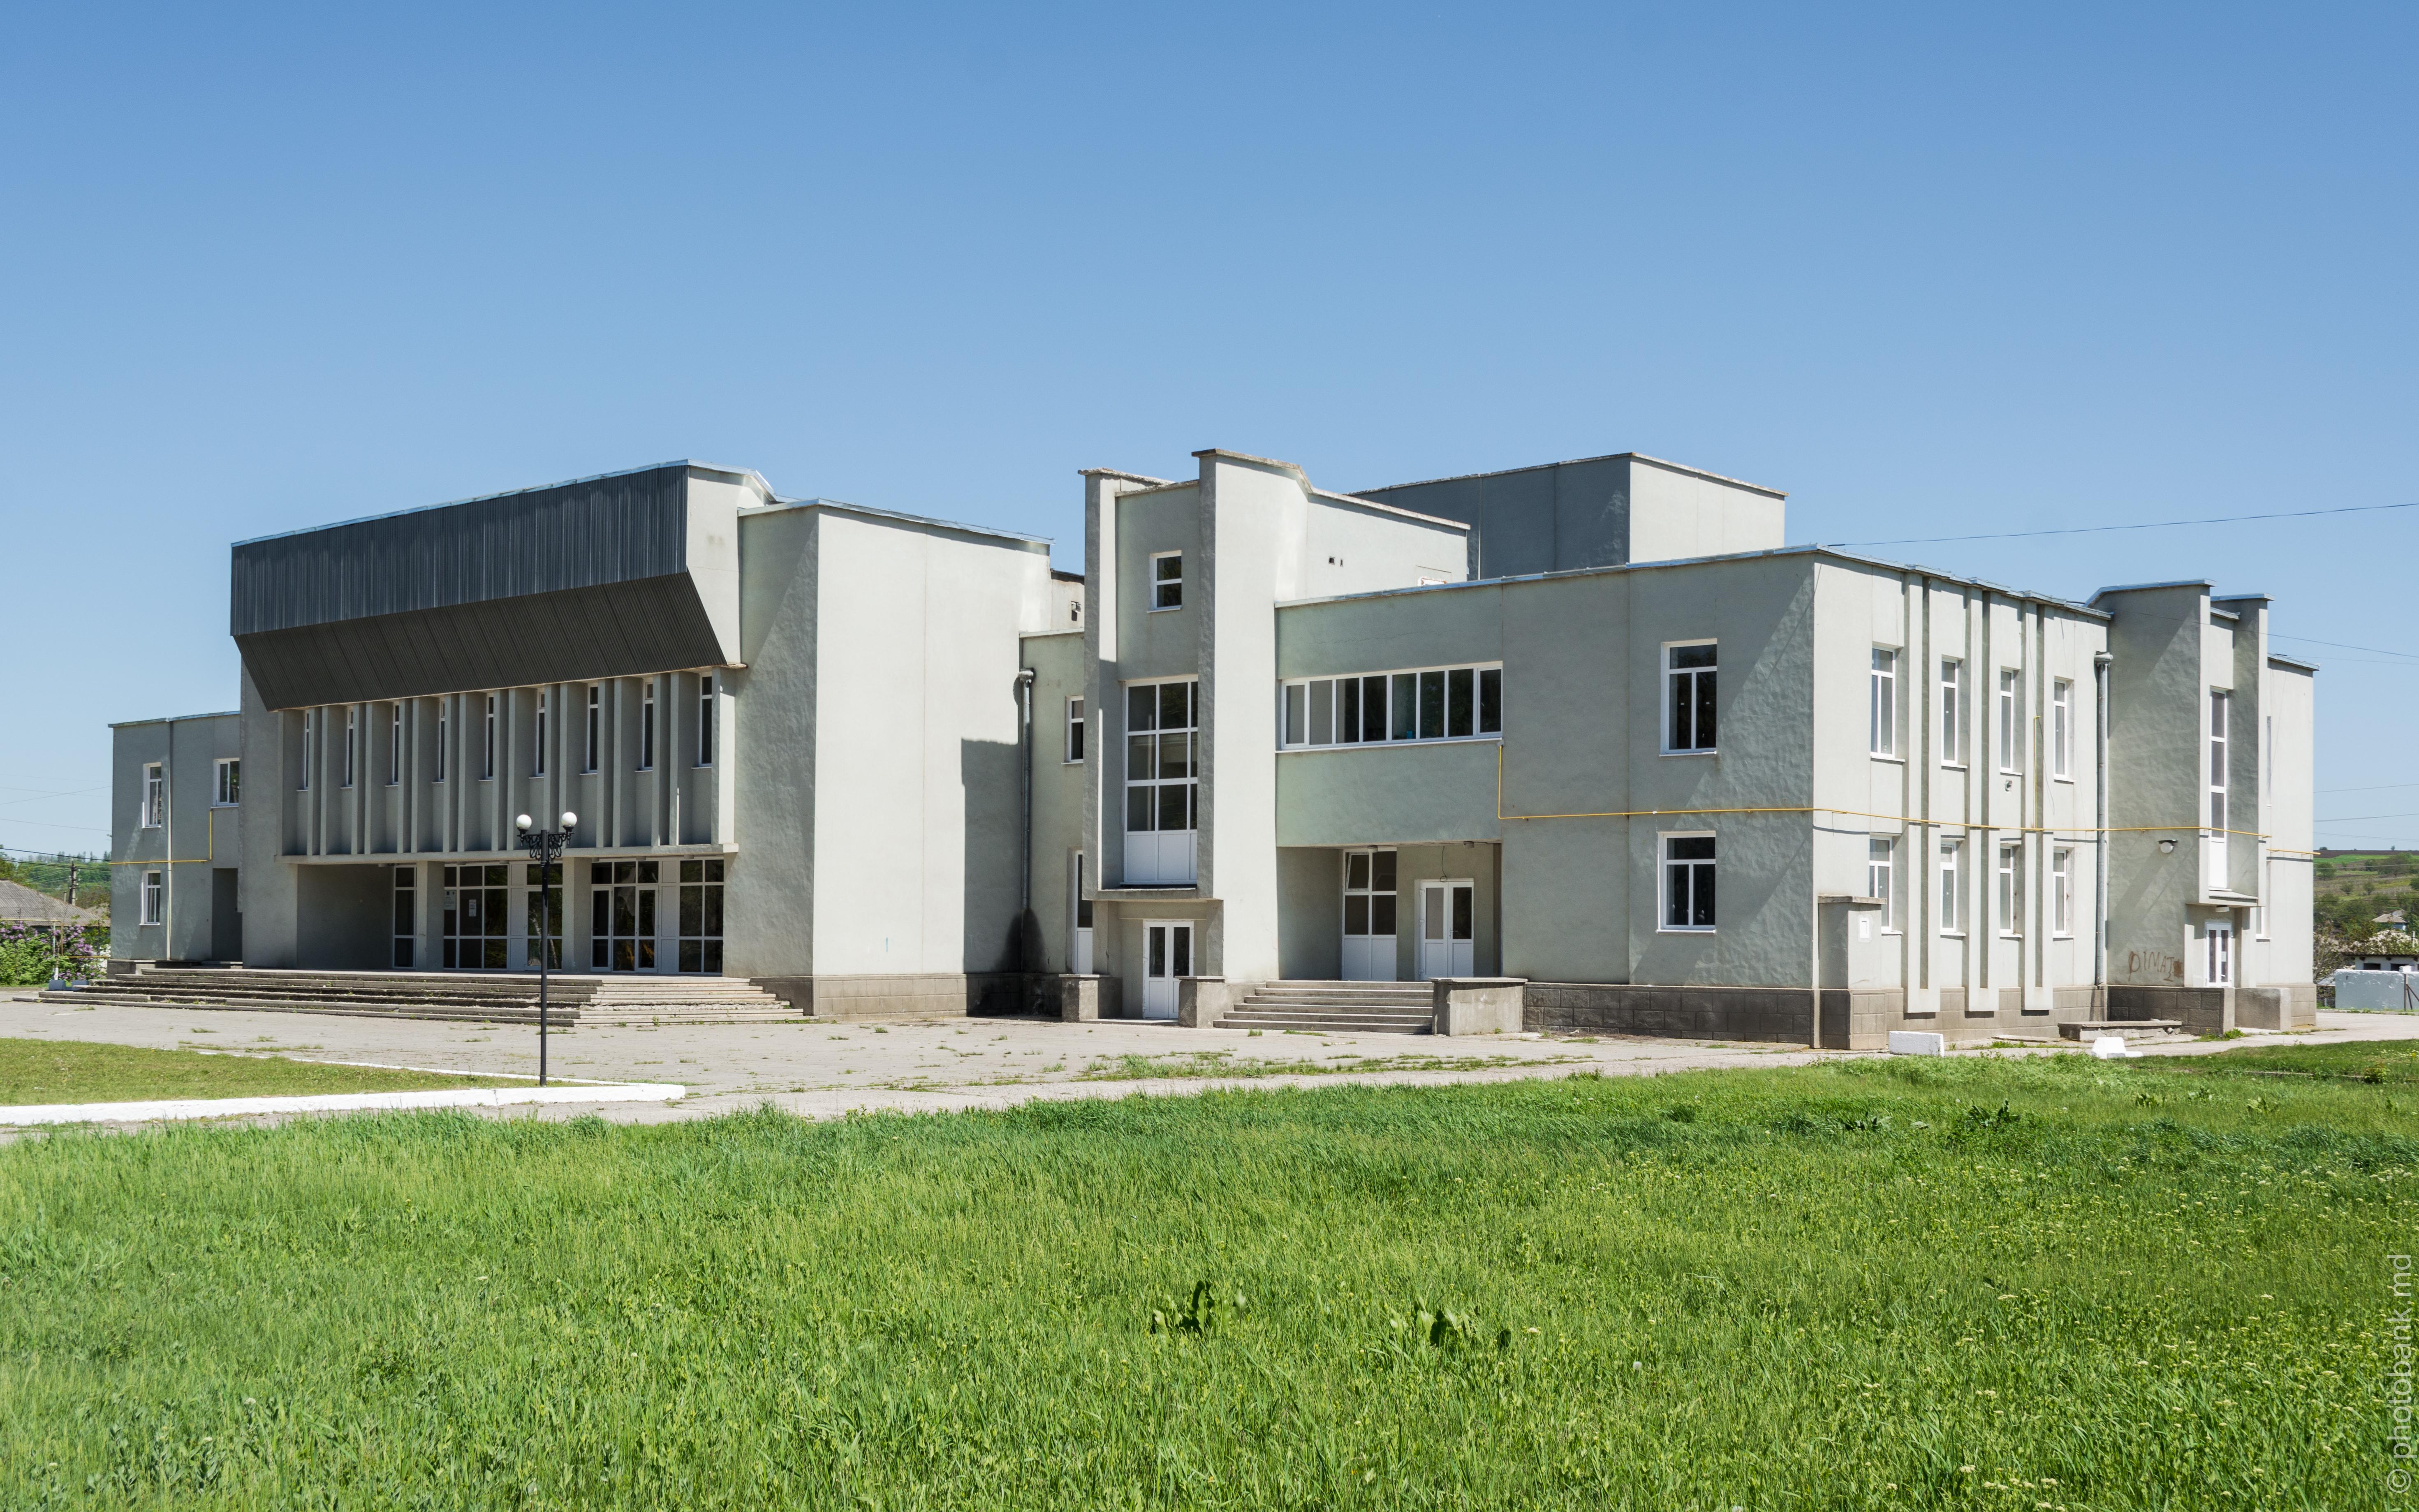 Дом культуры в Корлатенах (Рышканский район) / casa de cultura corlateni (raionul riscani) photo